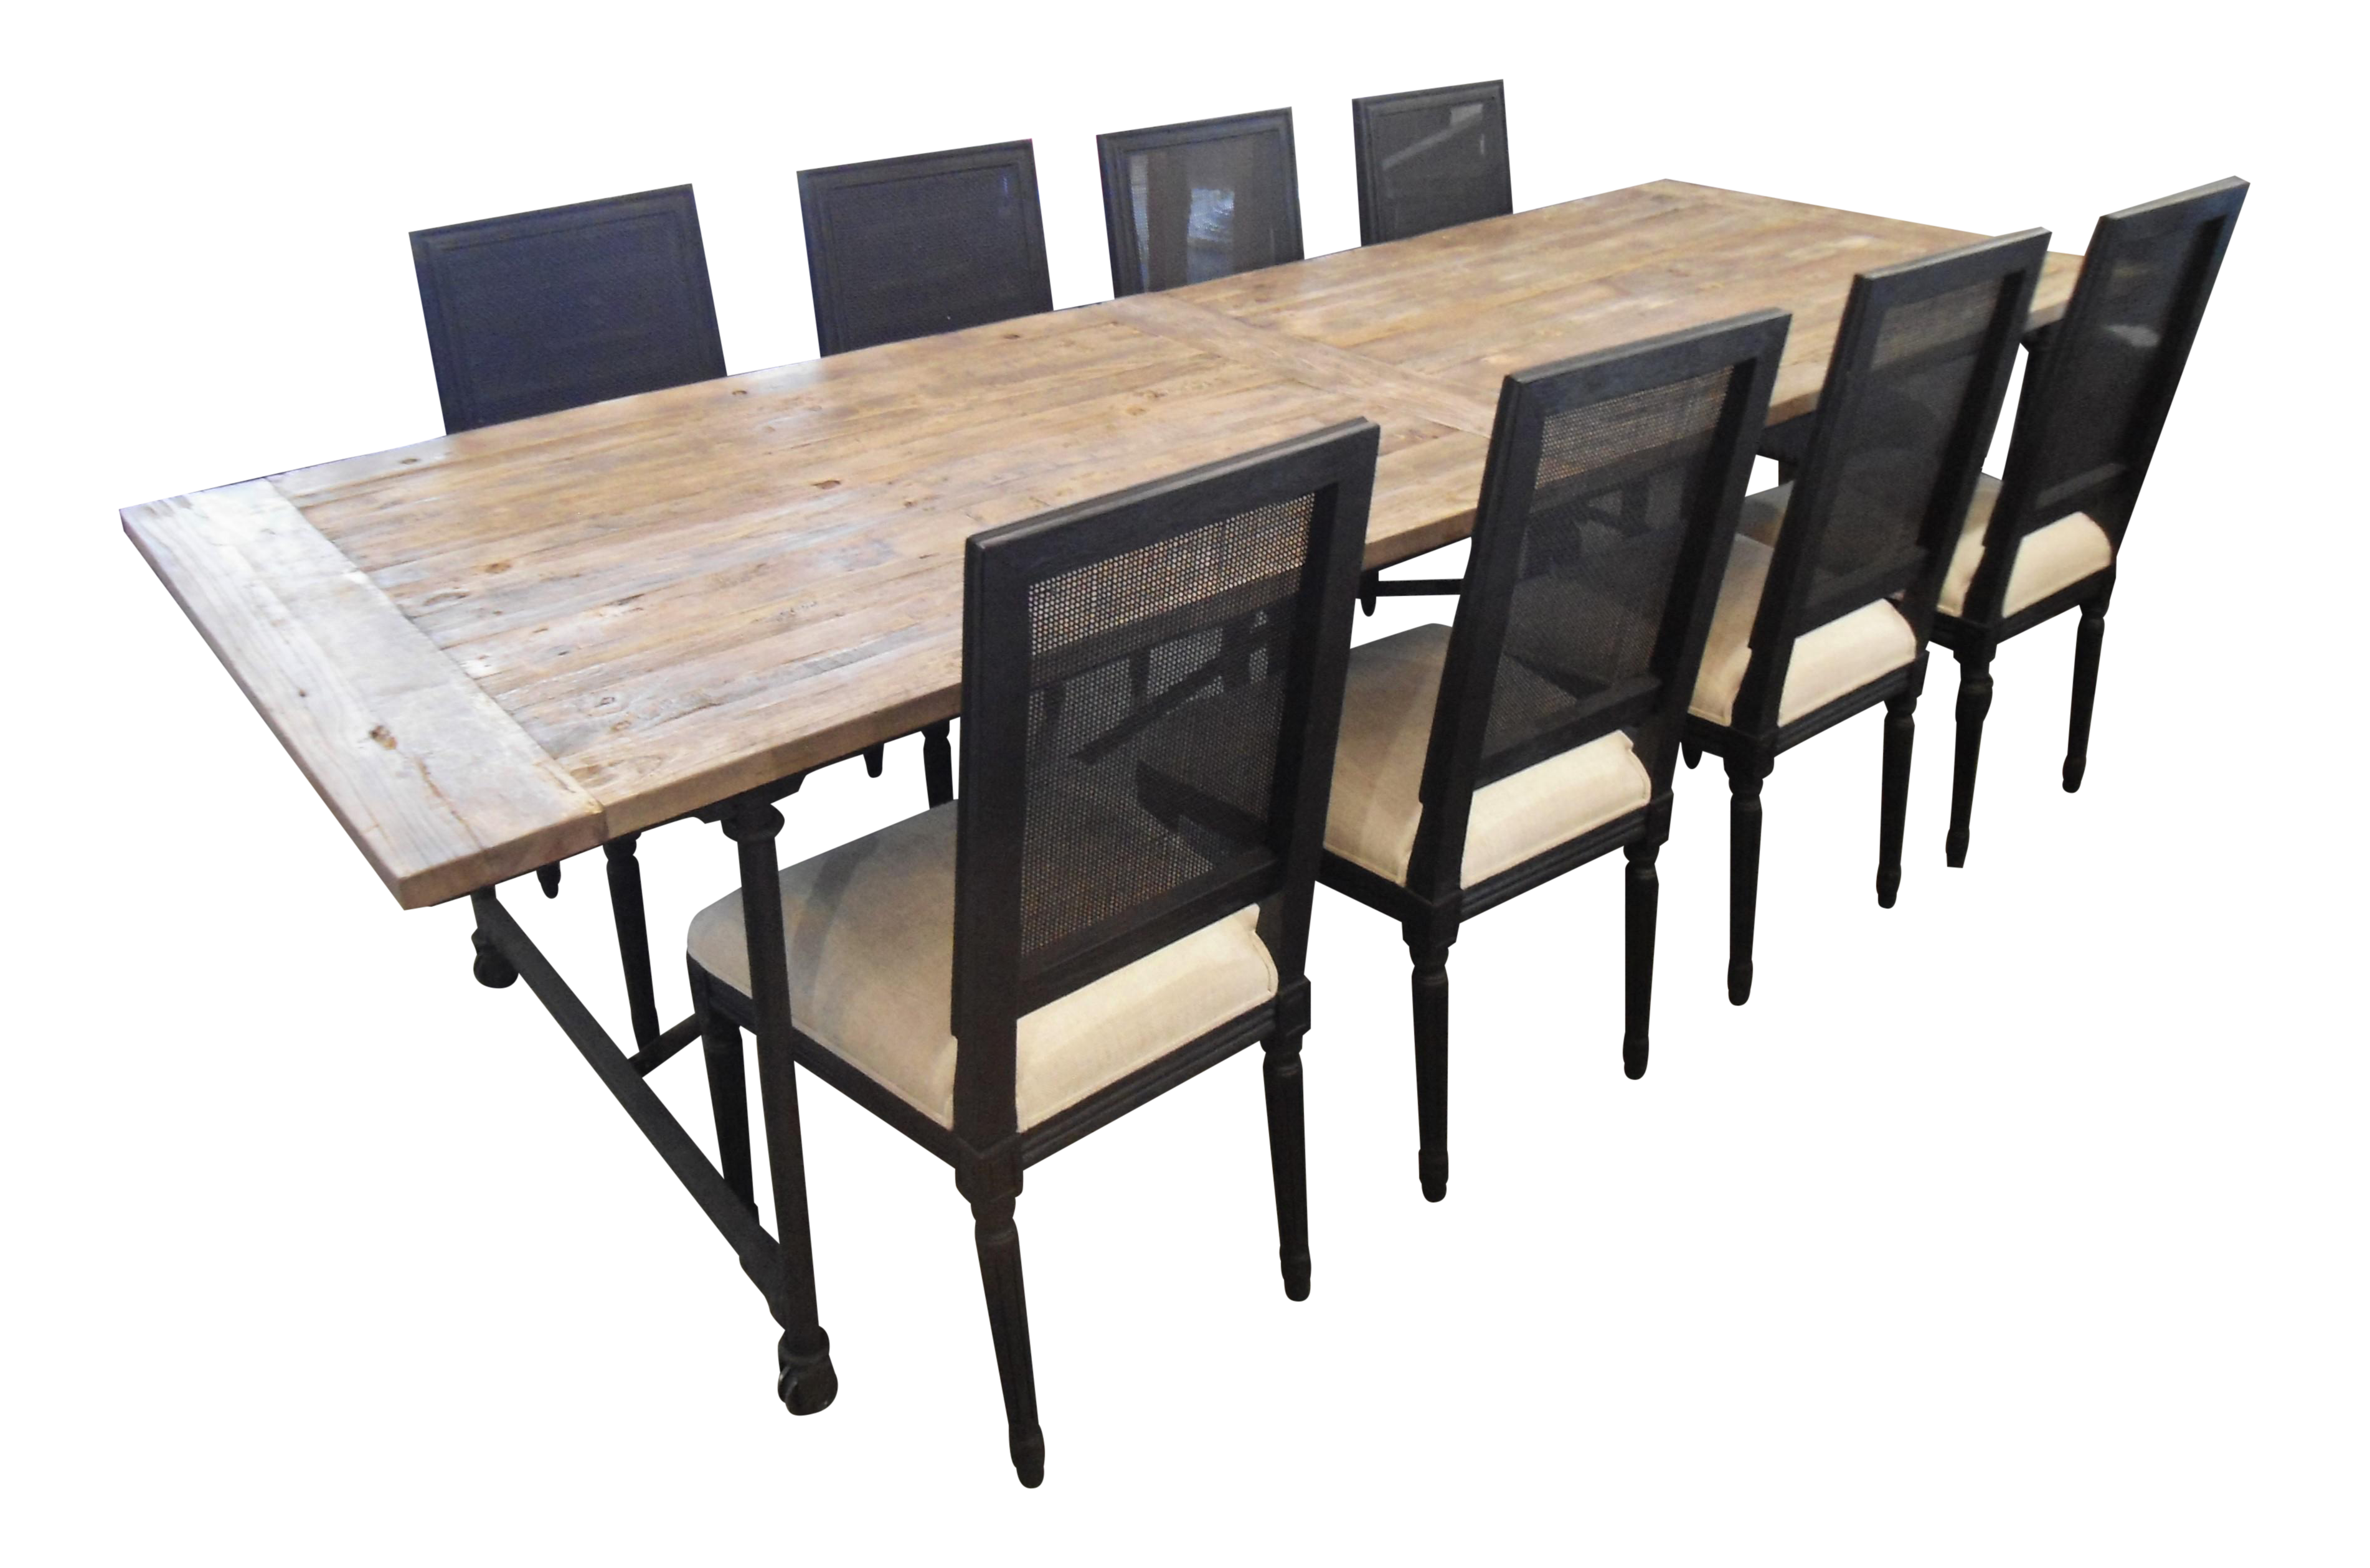 Restoration Hardware Flatiron Dining Table & Chairs | Chairish